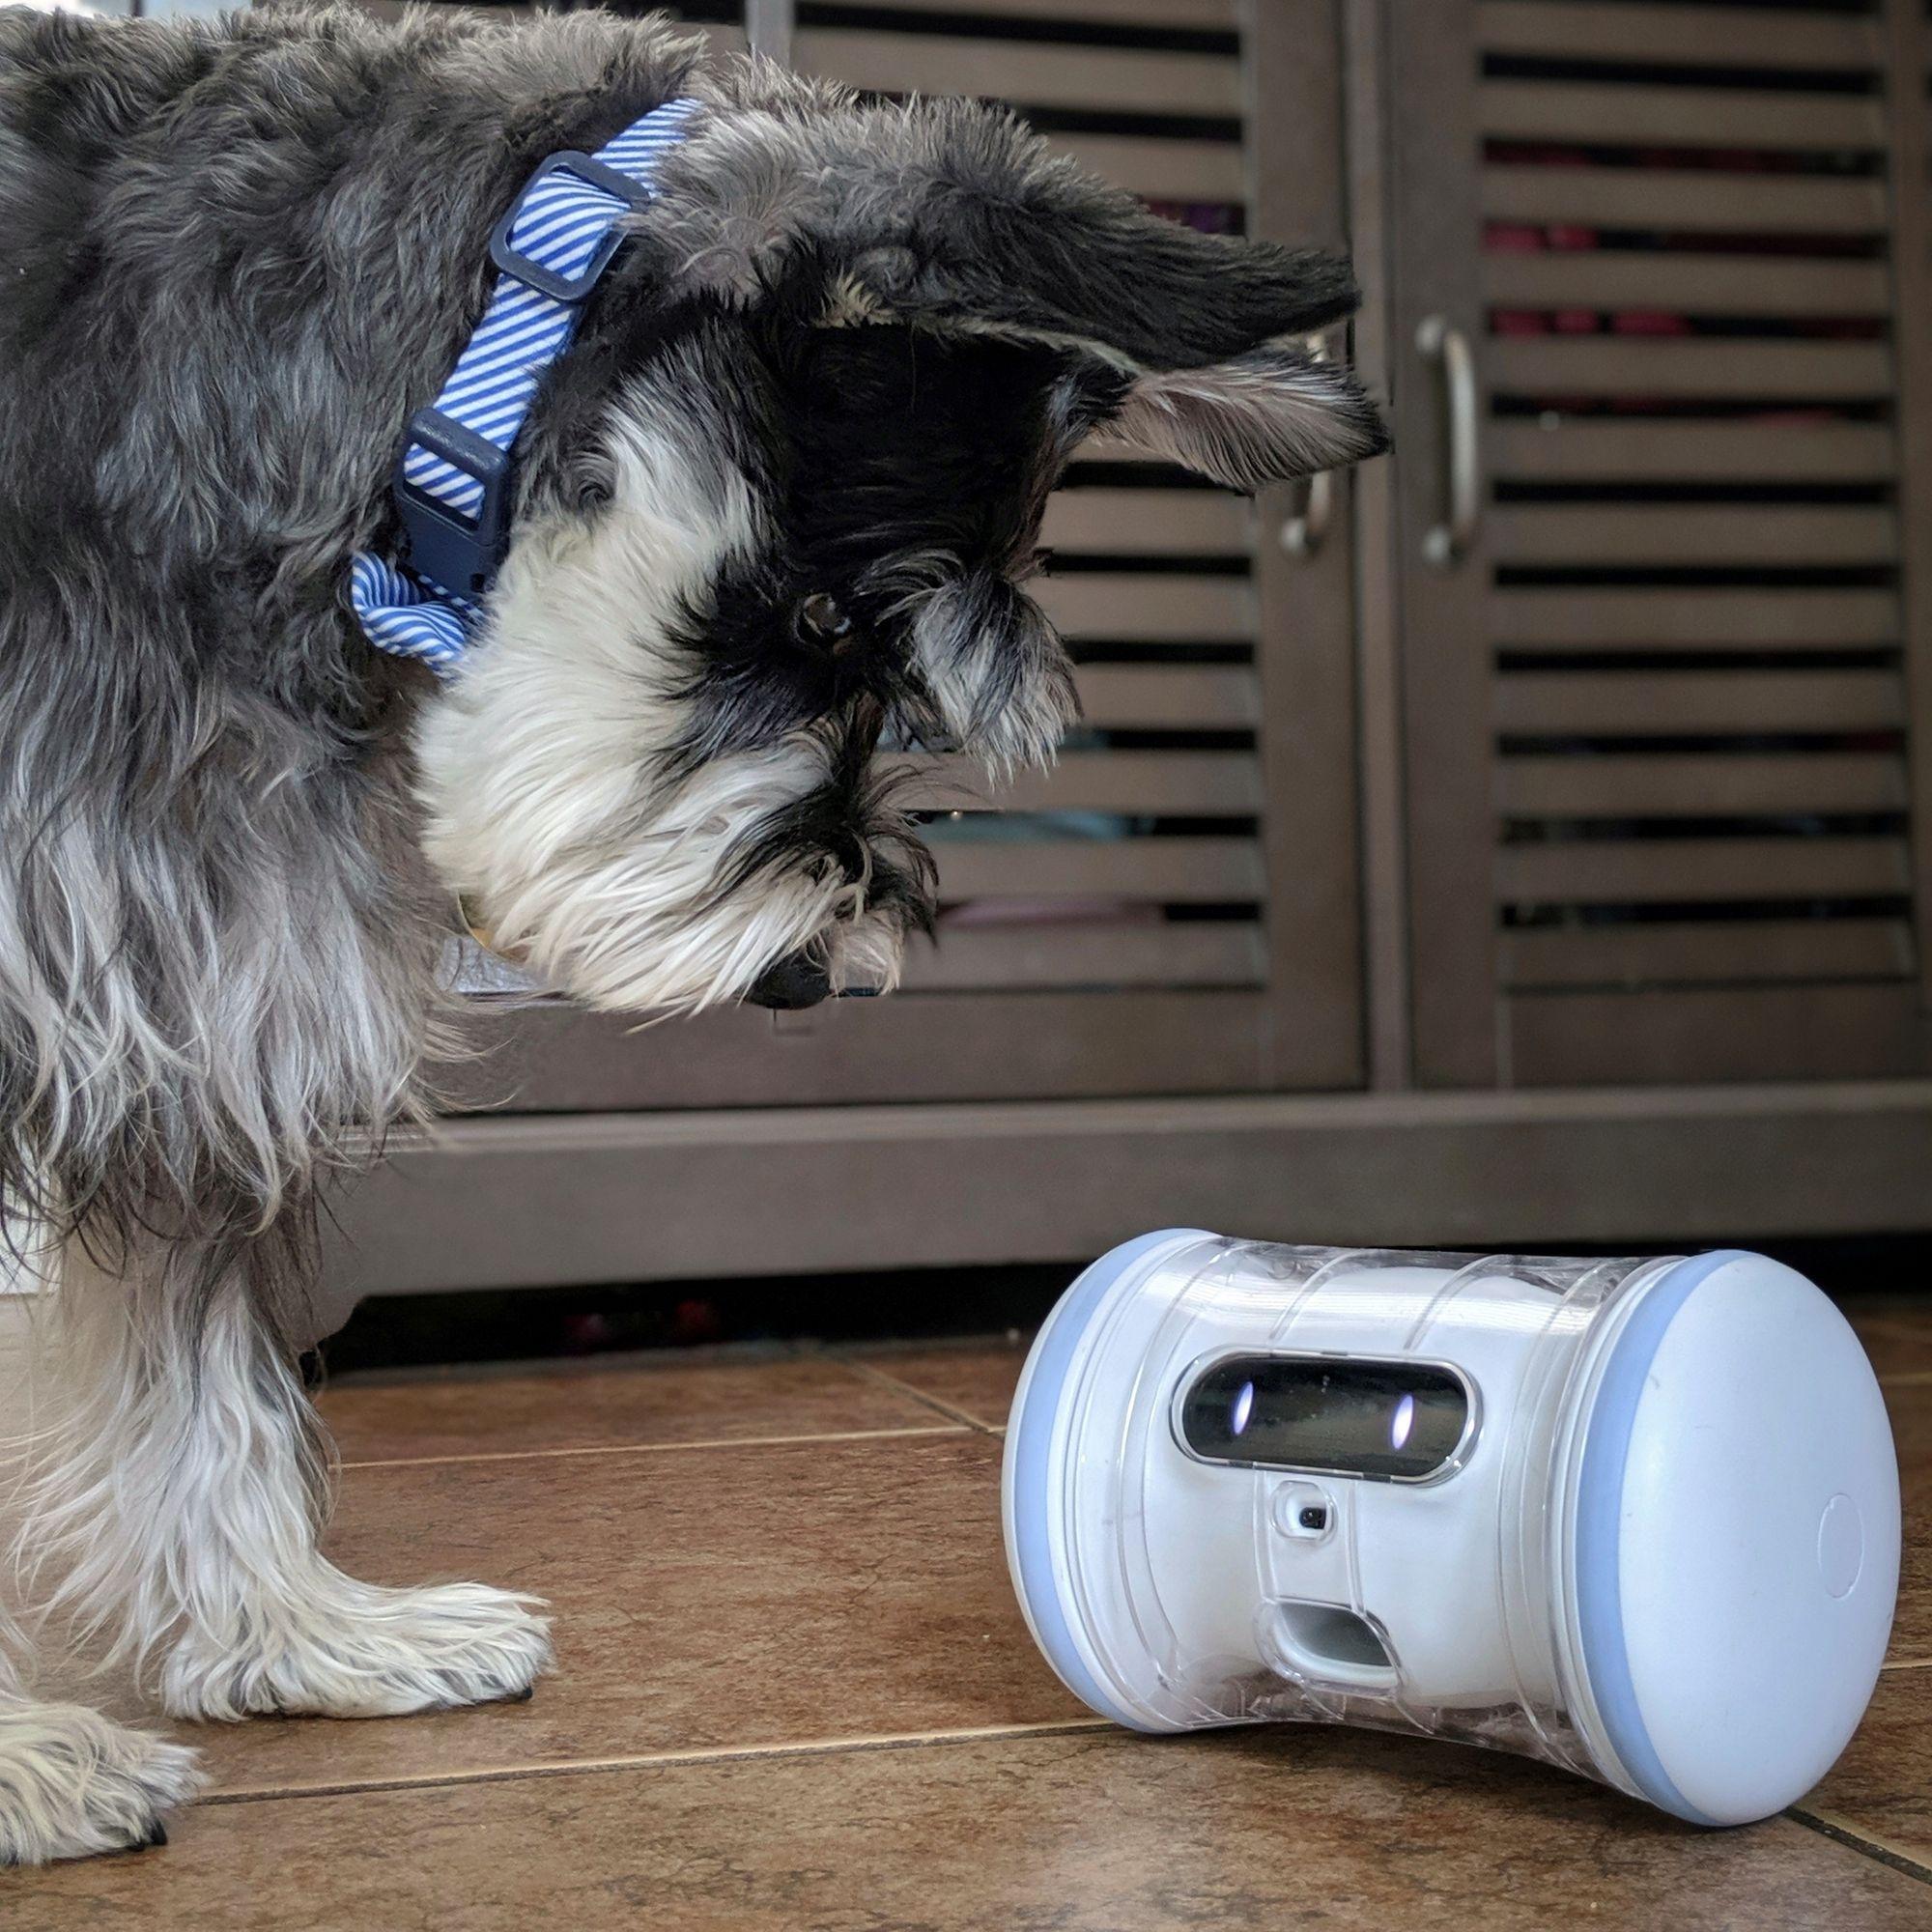 Pin By Varram On Varram Pet Fitness Robot Home Appliances Pets